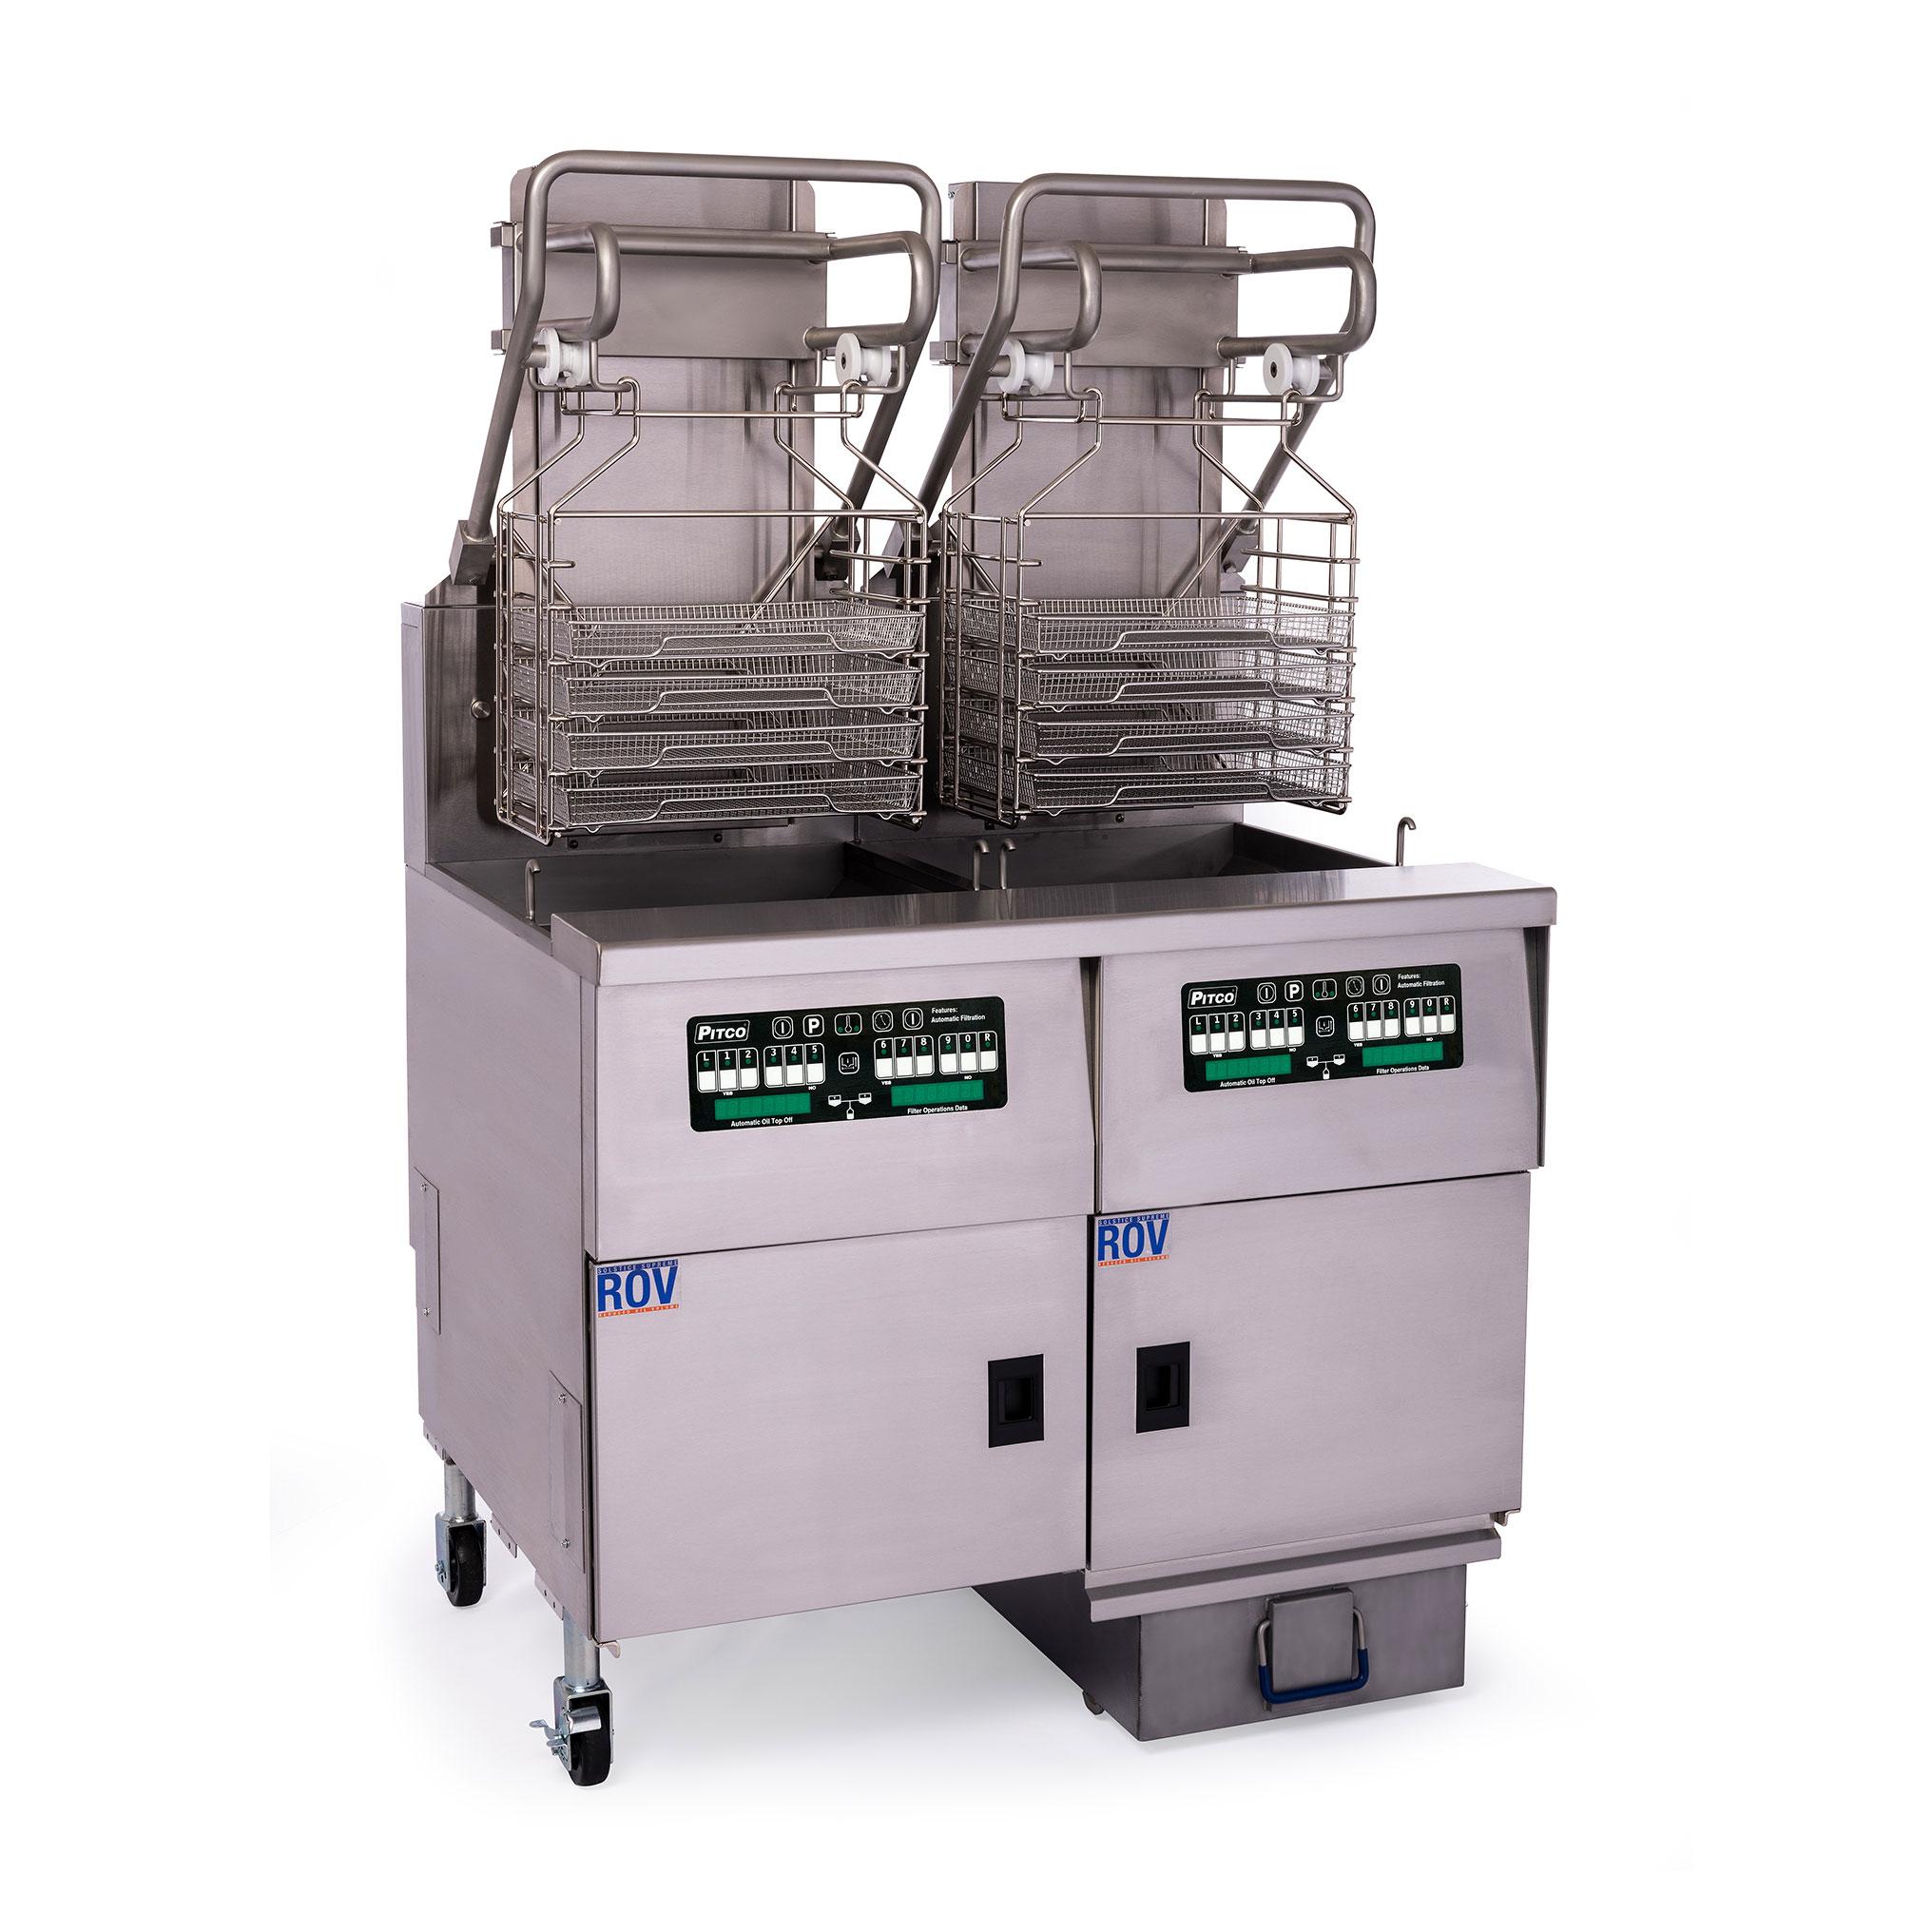 Pitco Frialator SELVRF-2/FD fryer, electric, multiple battery